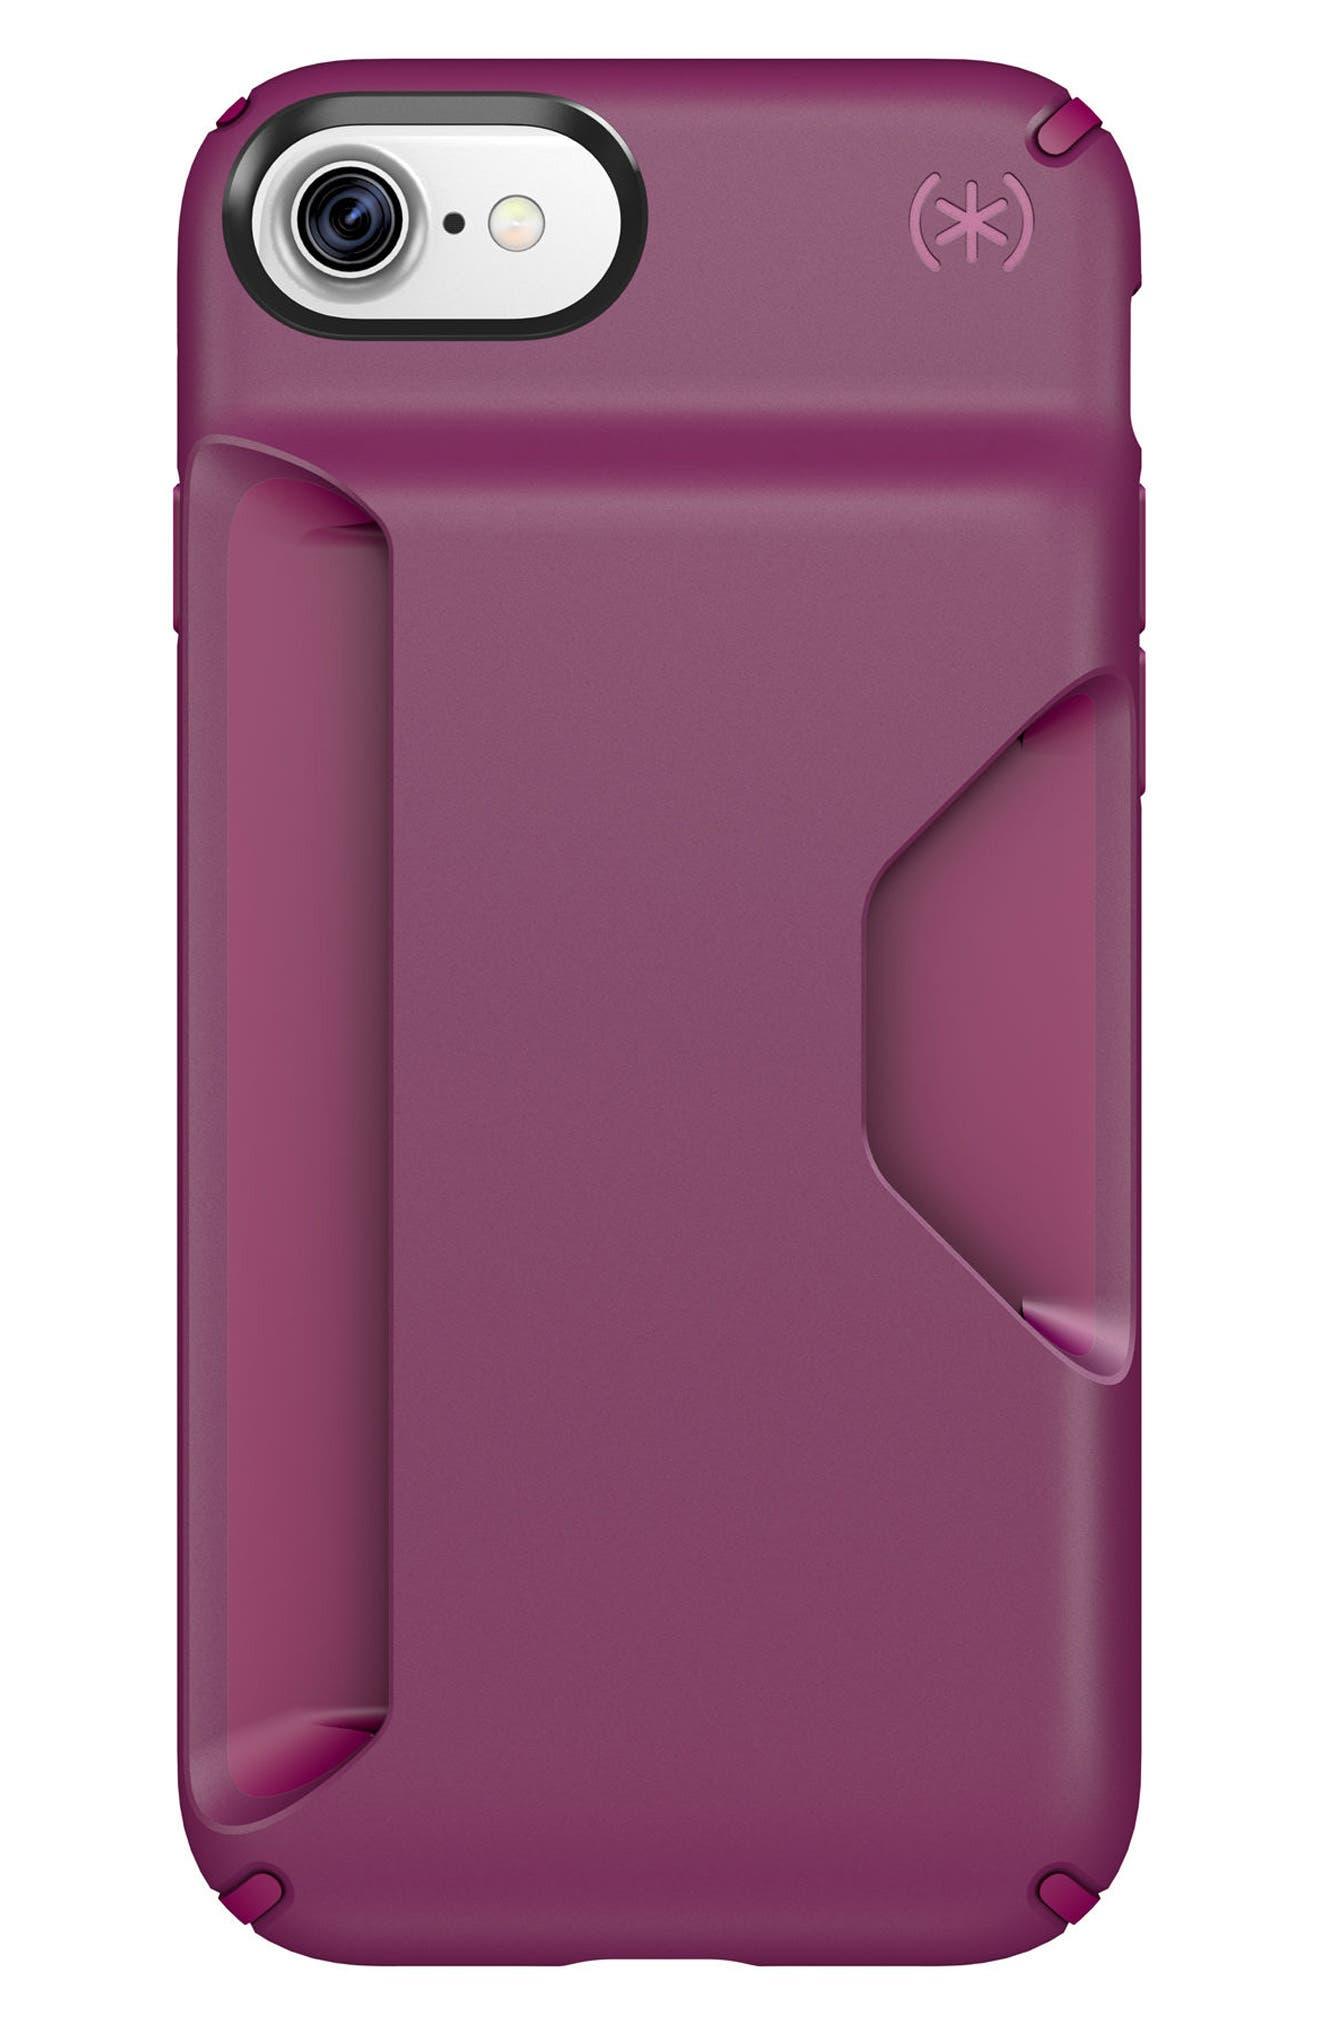 Speck Presidio Wallet iPhone 6/6s/7/8 Plus Case